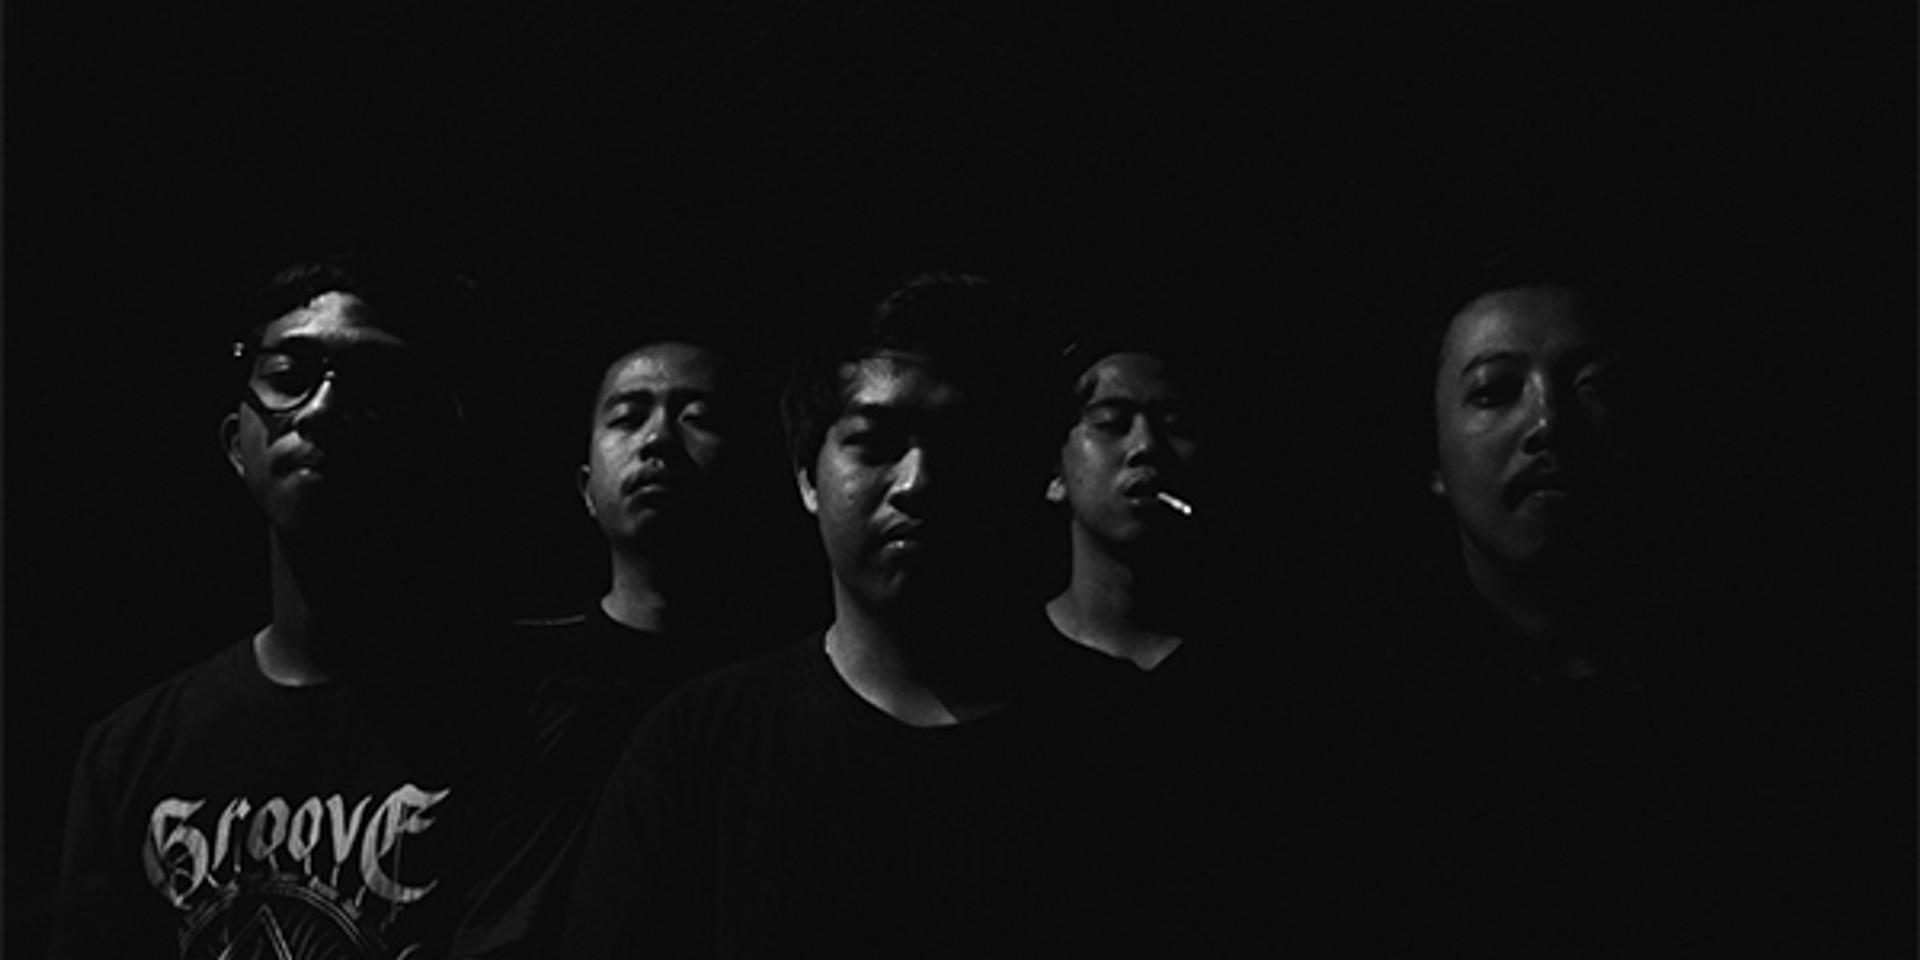 Bali-based mathcore band Advark release gritty new single 'Geramus' — listen